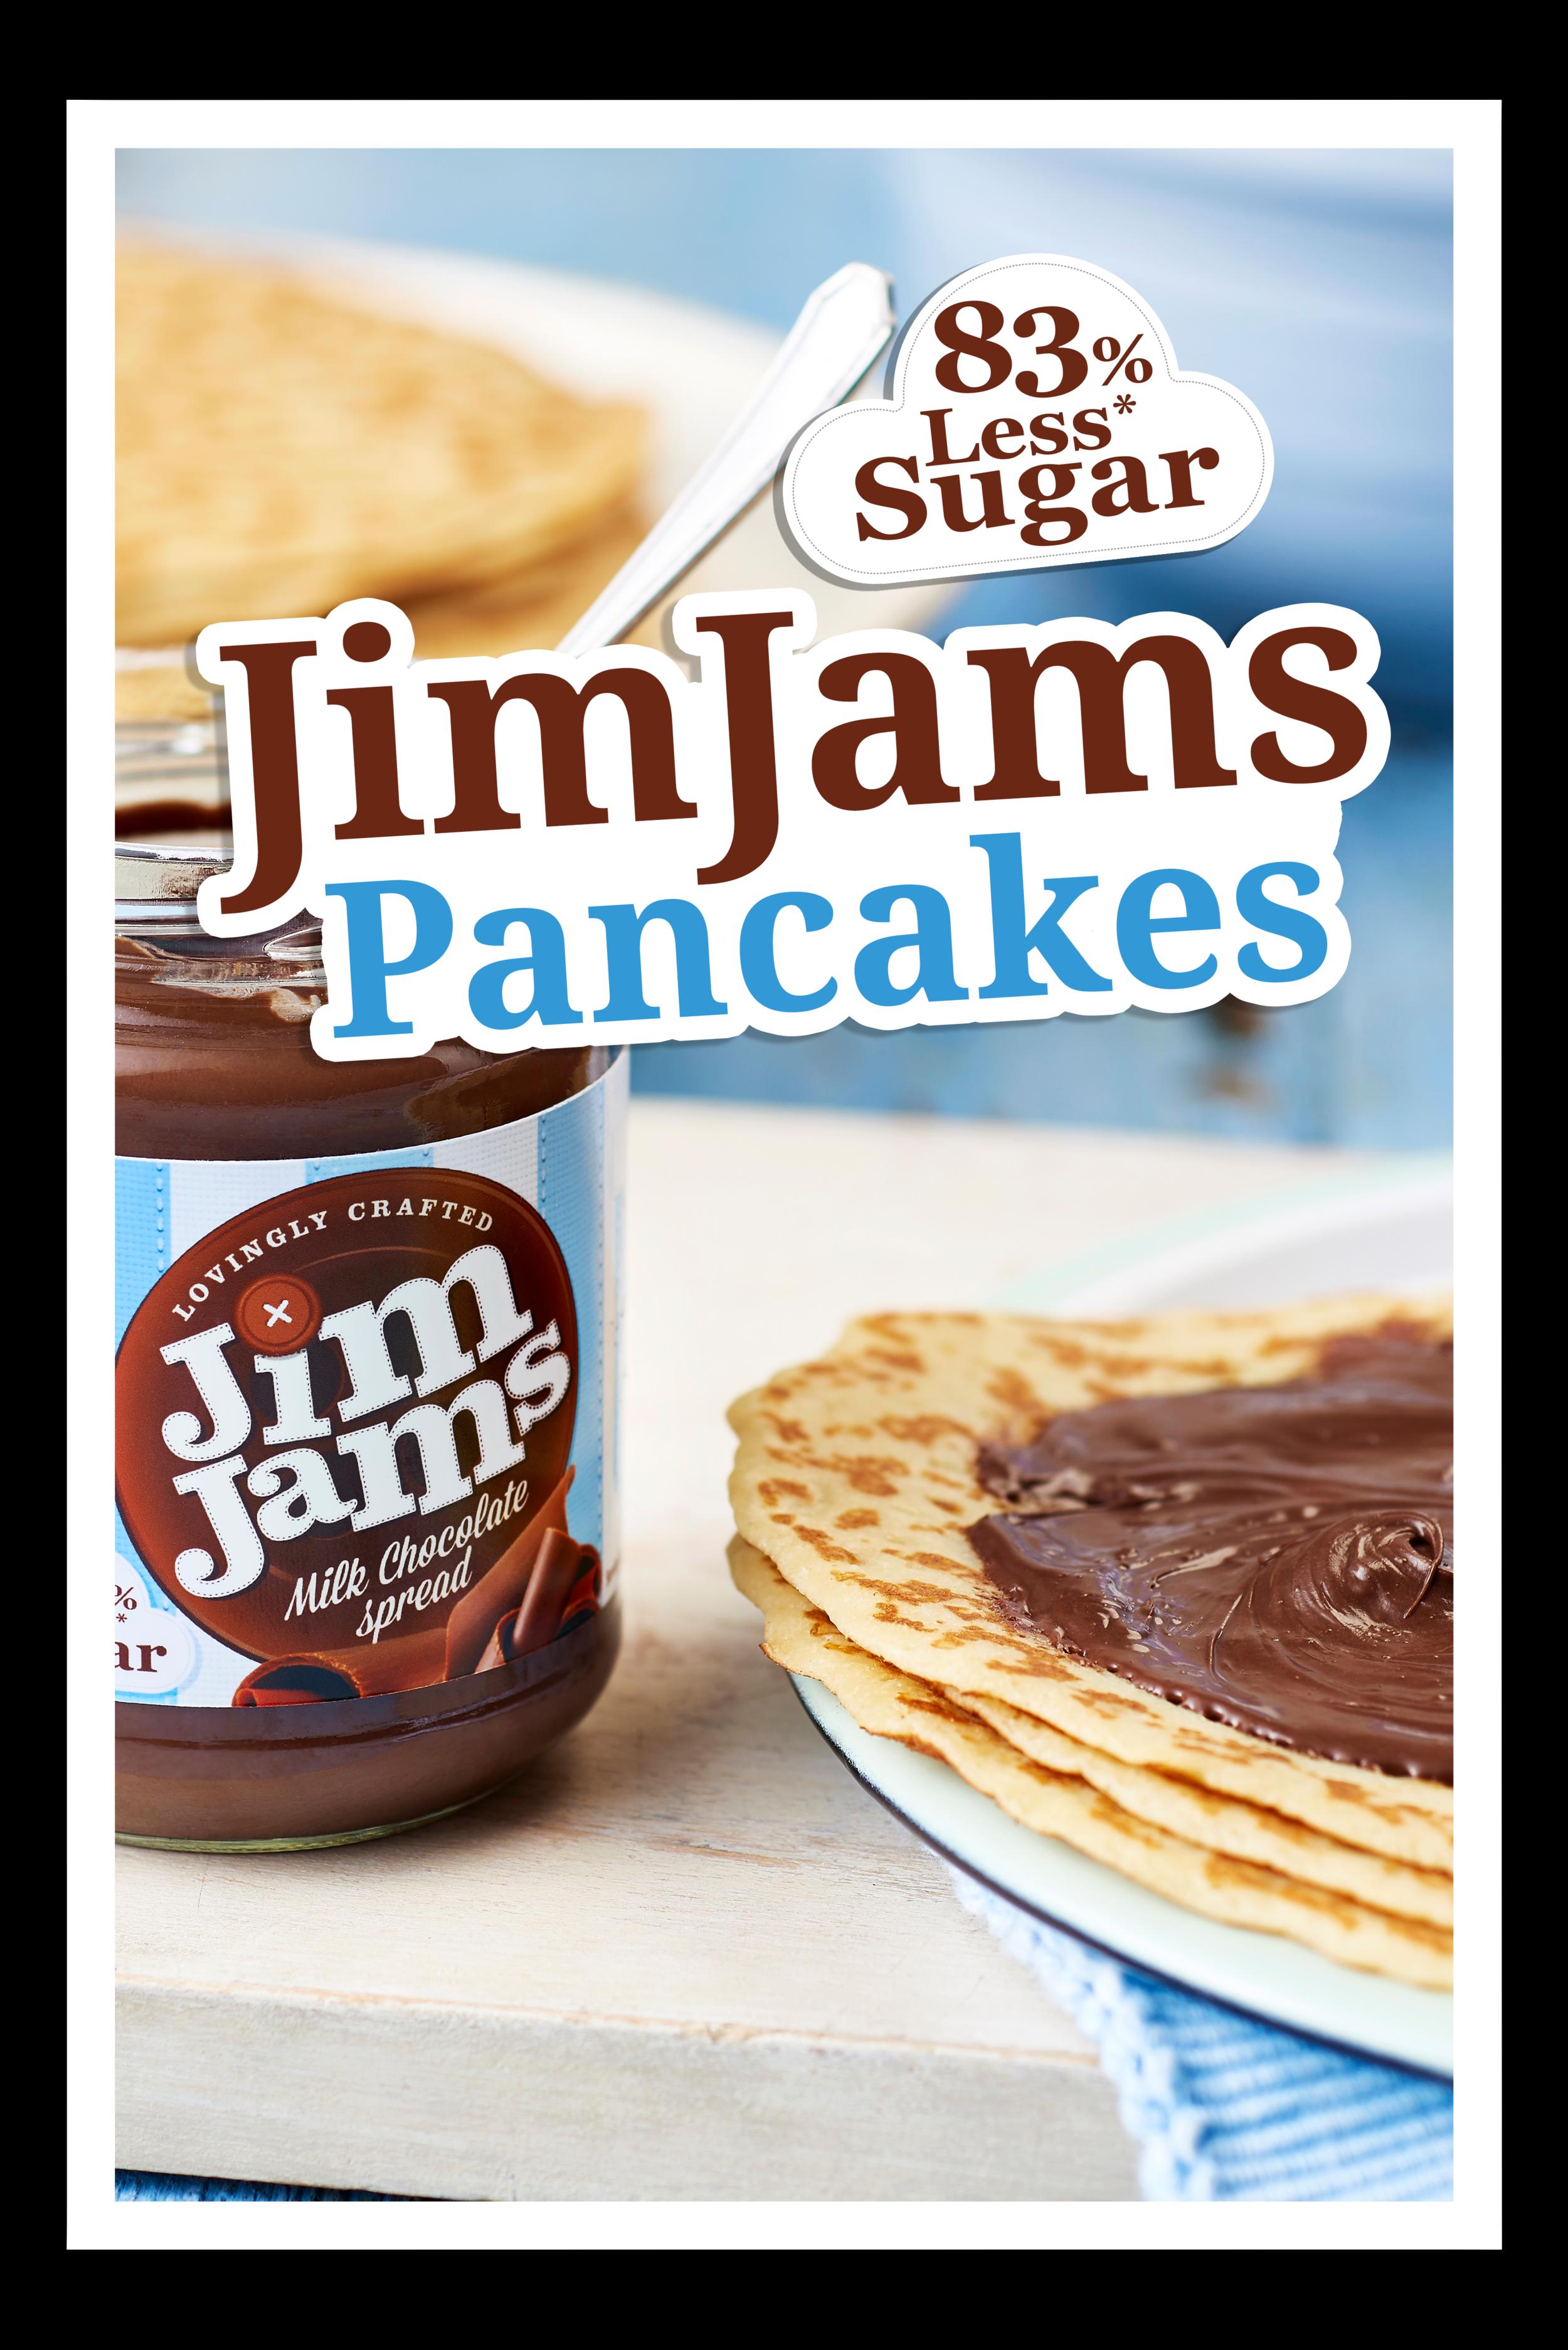 JimJams Pancakes